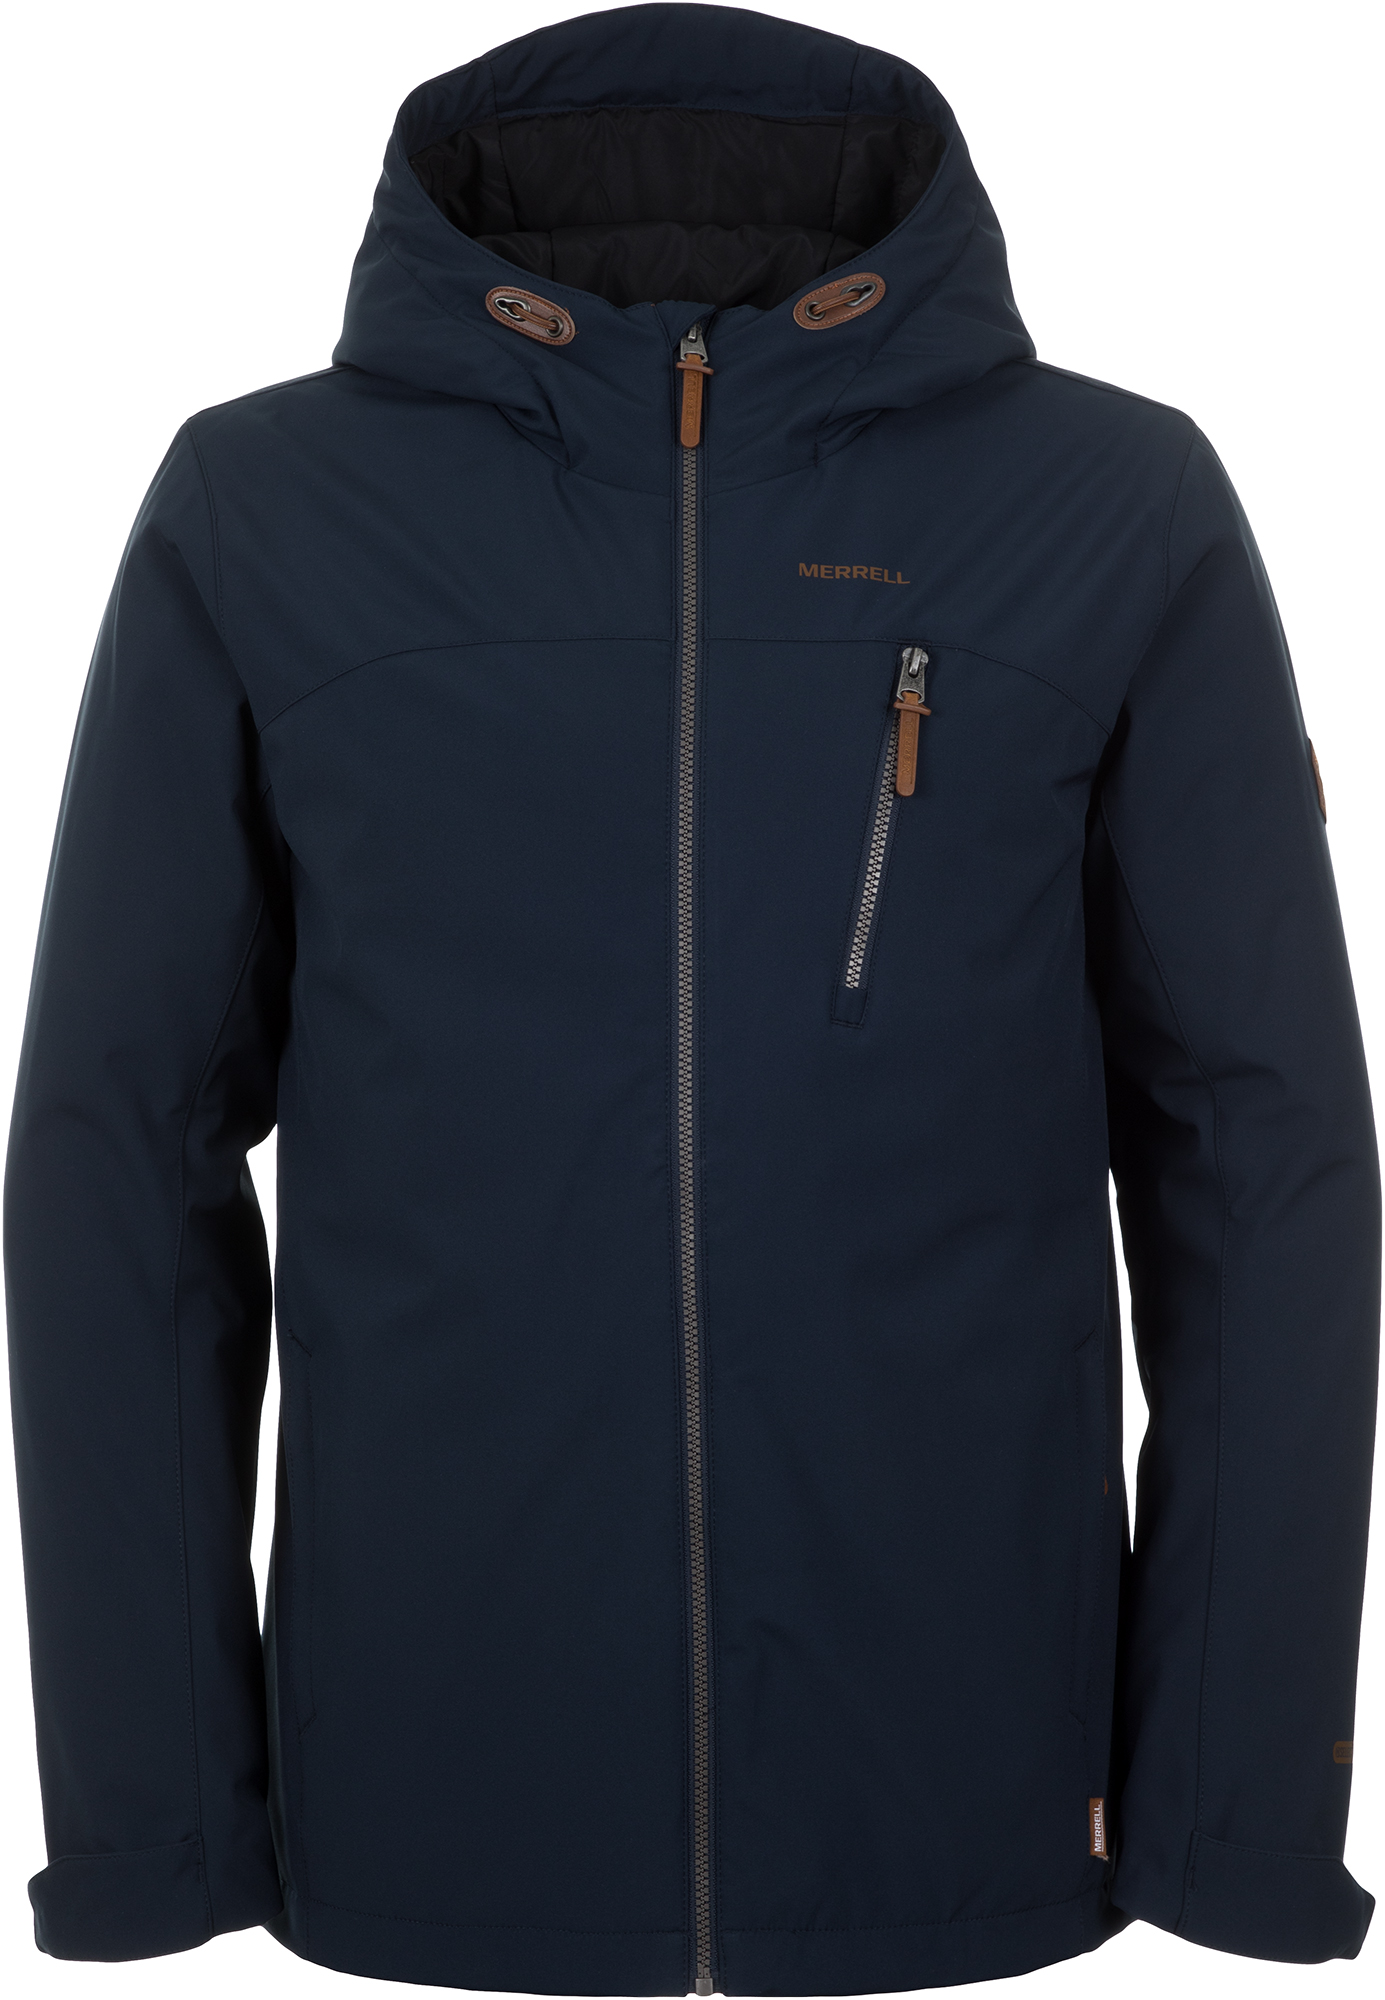 купить Merrell Куртка утепленная мужская Merrell, размер 54 по цене 5599 рублей